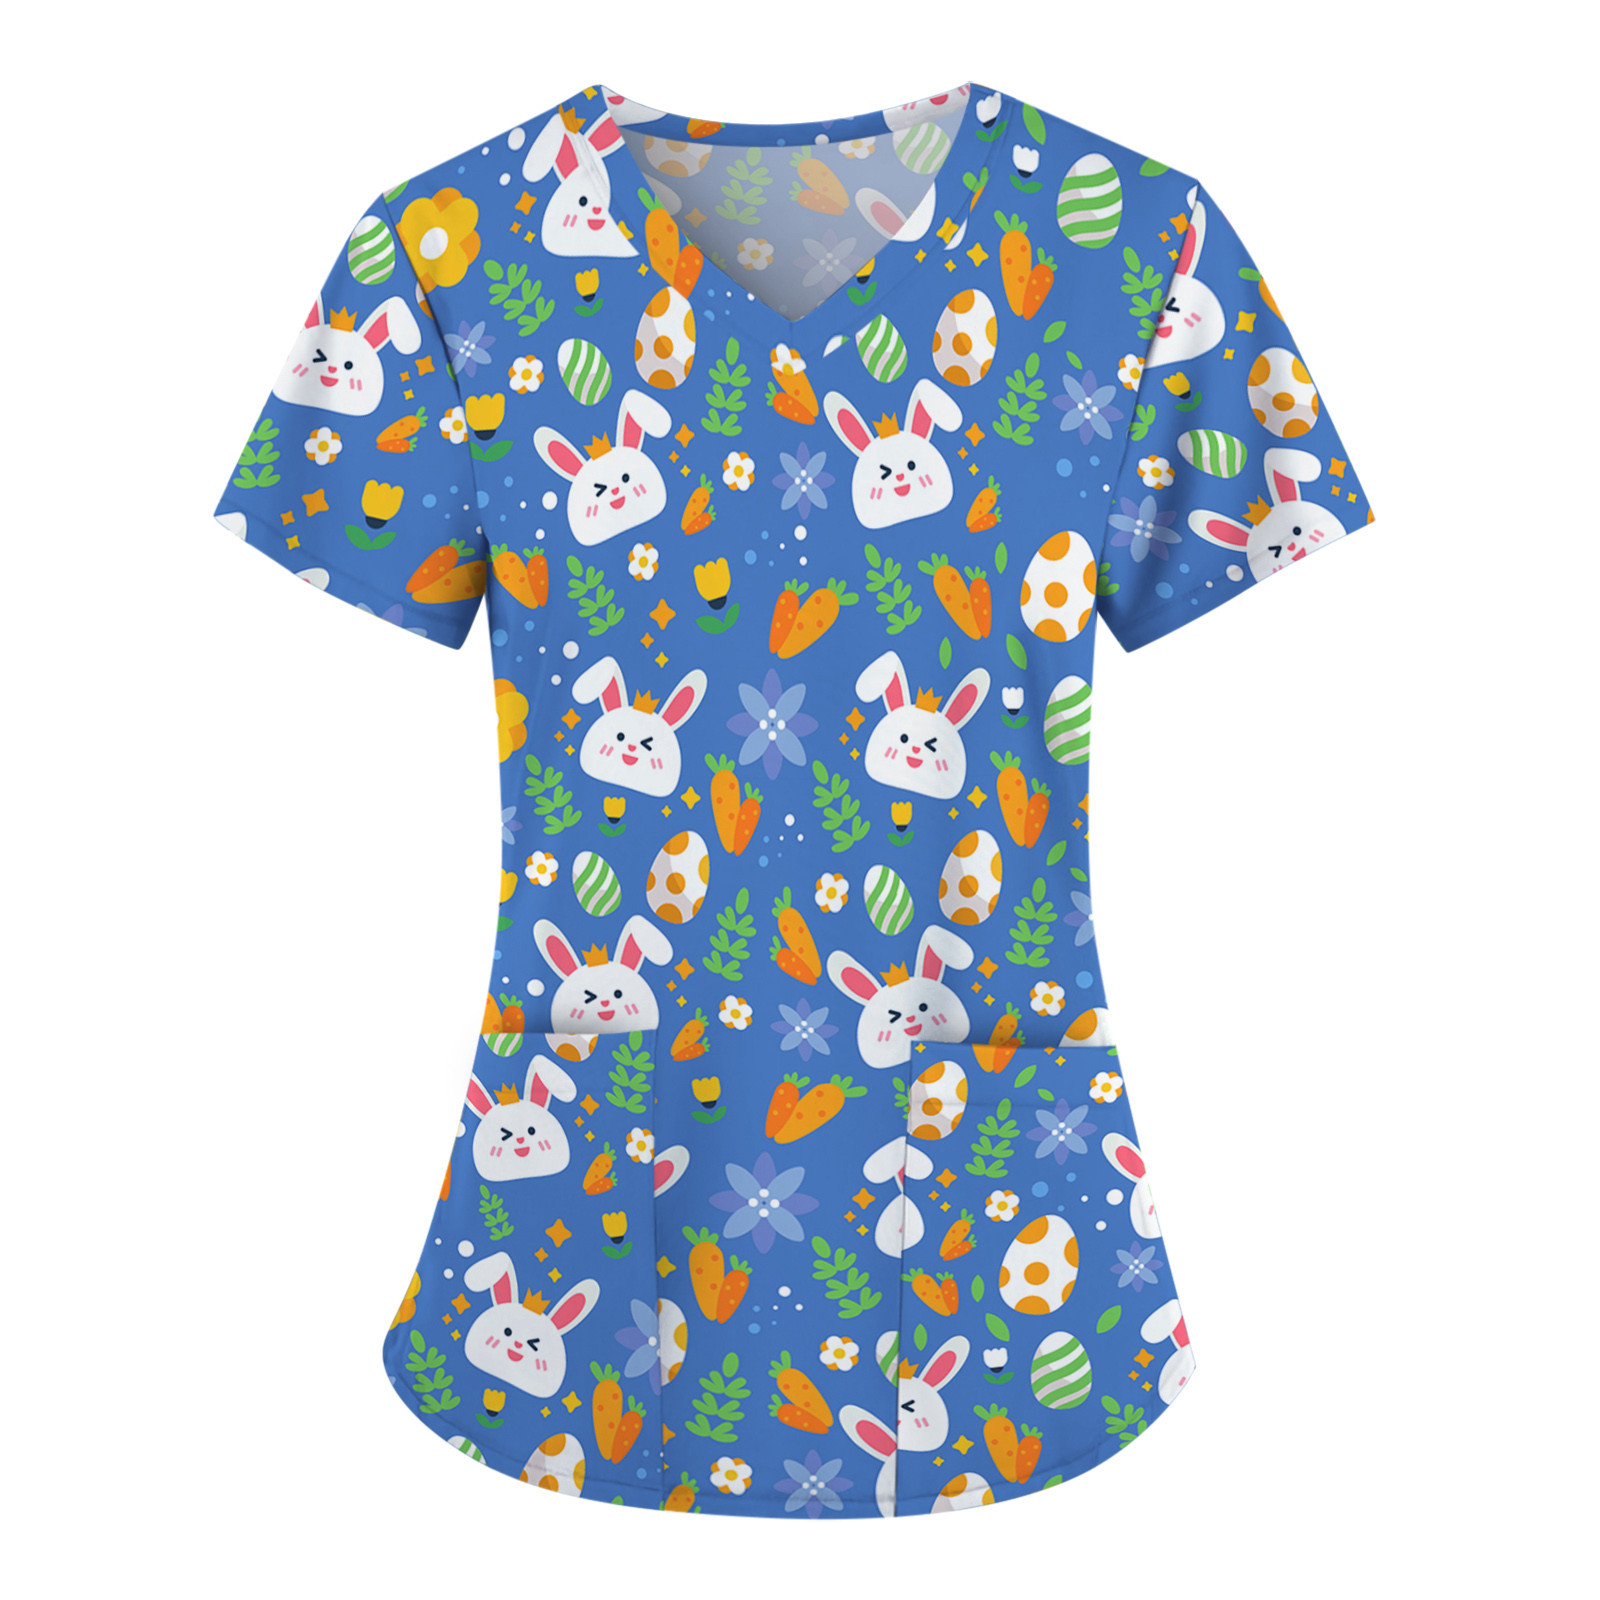 Scrubs Women T-Shirts Uniform Short Sleeves V-Neck Tee Tops Cartoon Print Working Uniform Female Tshirts женские футболки